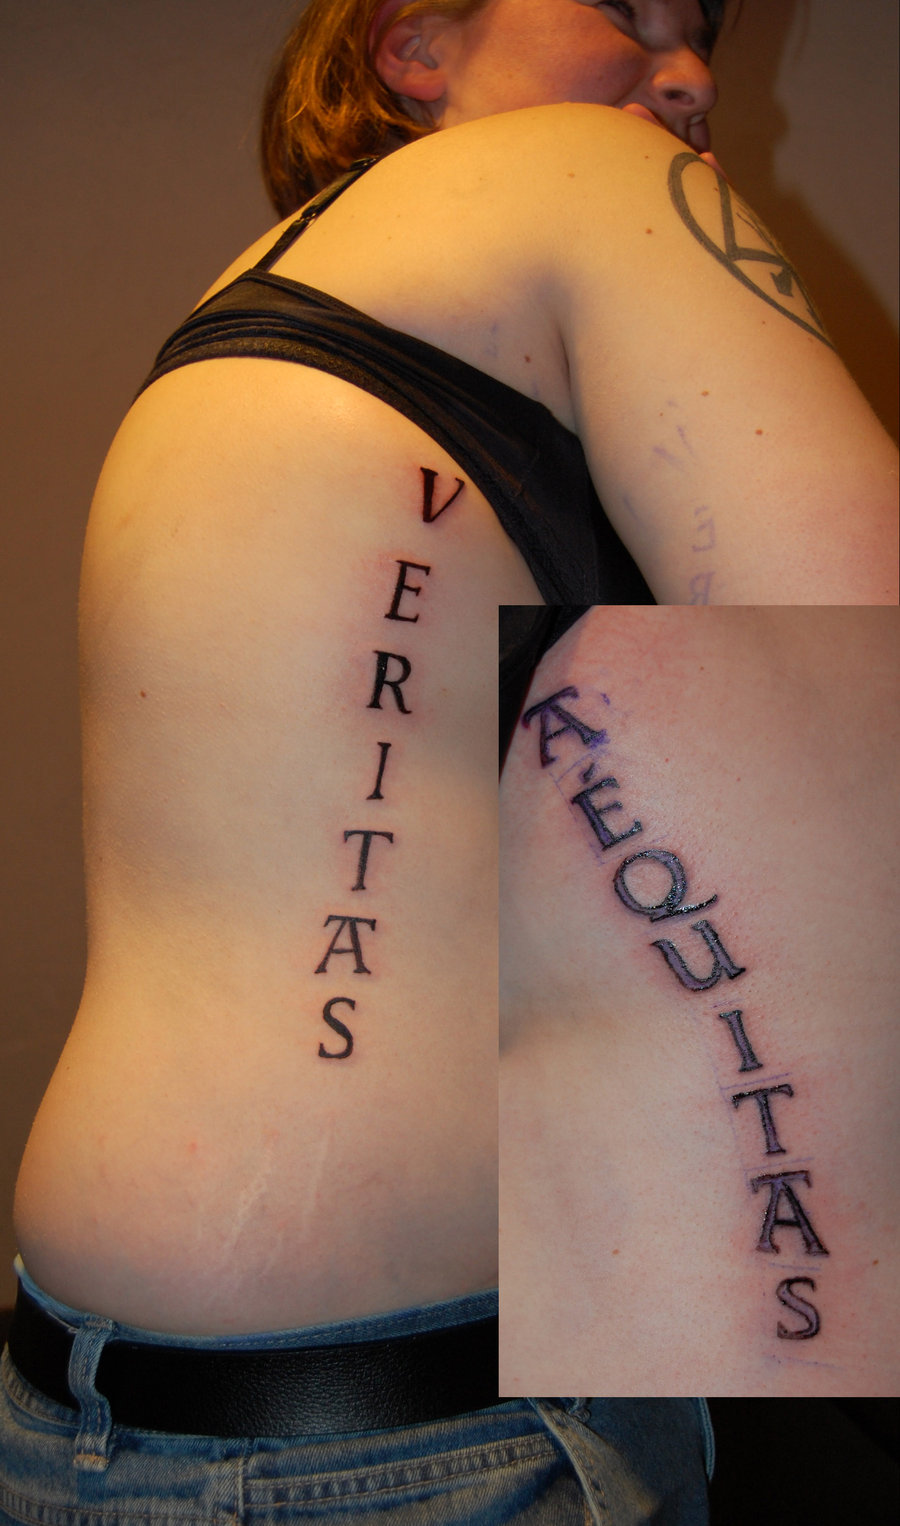 Veritas Aequitas Tattoos on Both Ribs Area, Tattoo Idea for Women (NSFW)